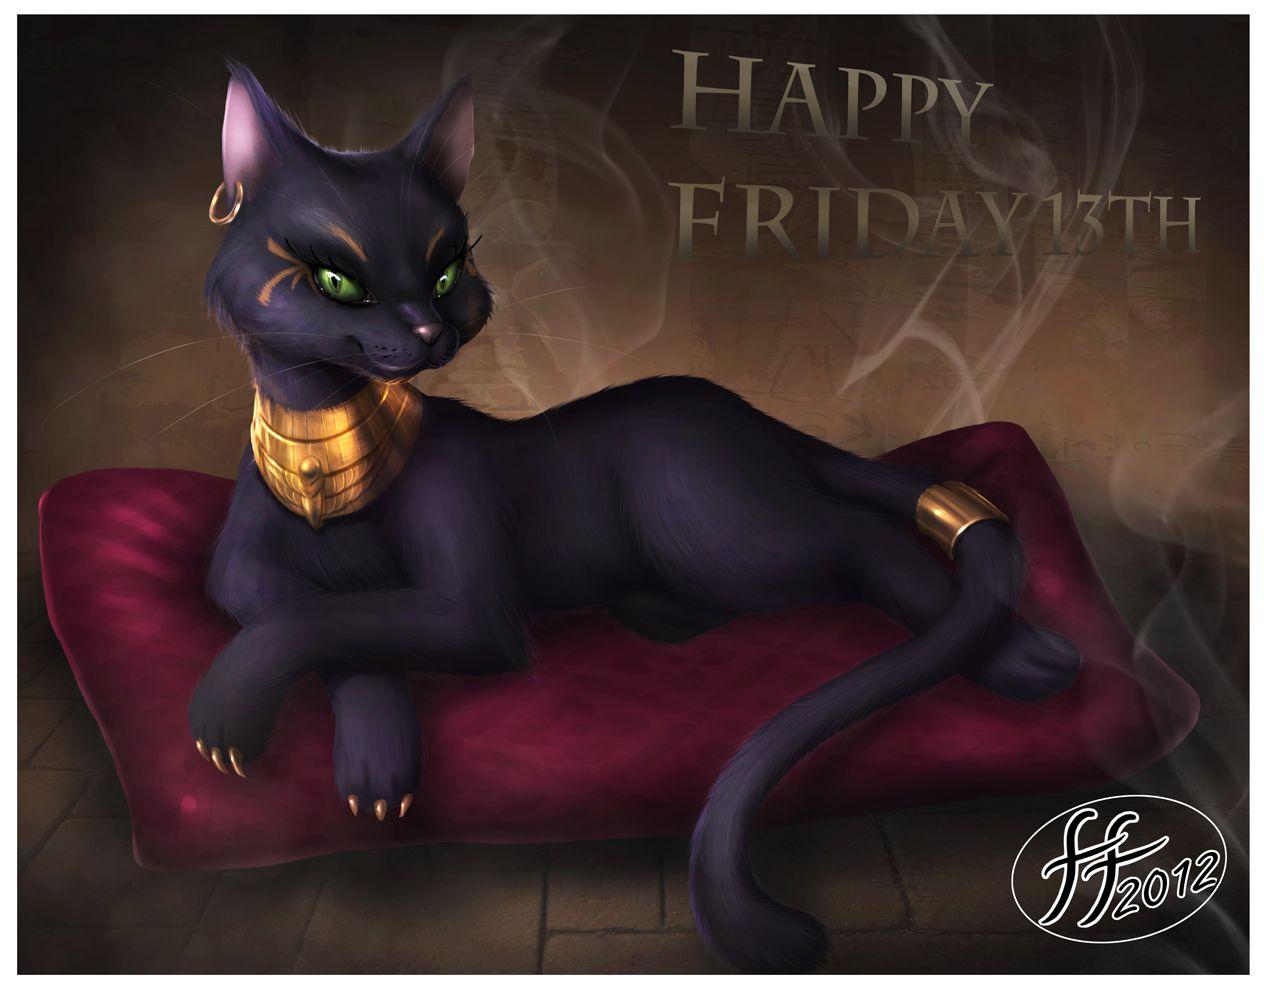 Happy Ancient Friday 1...